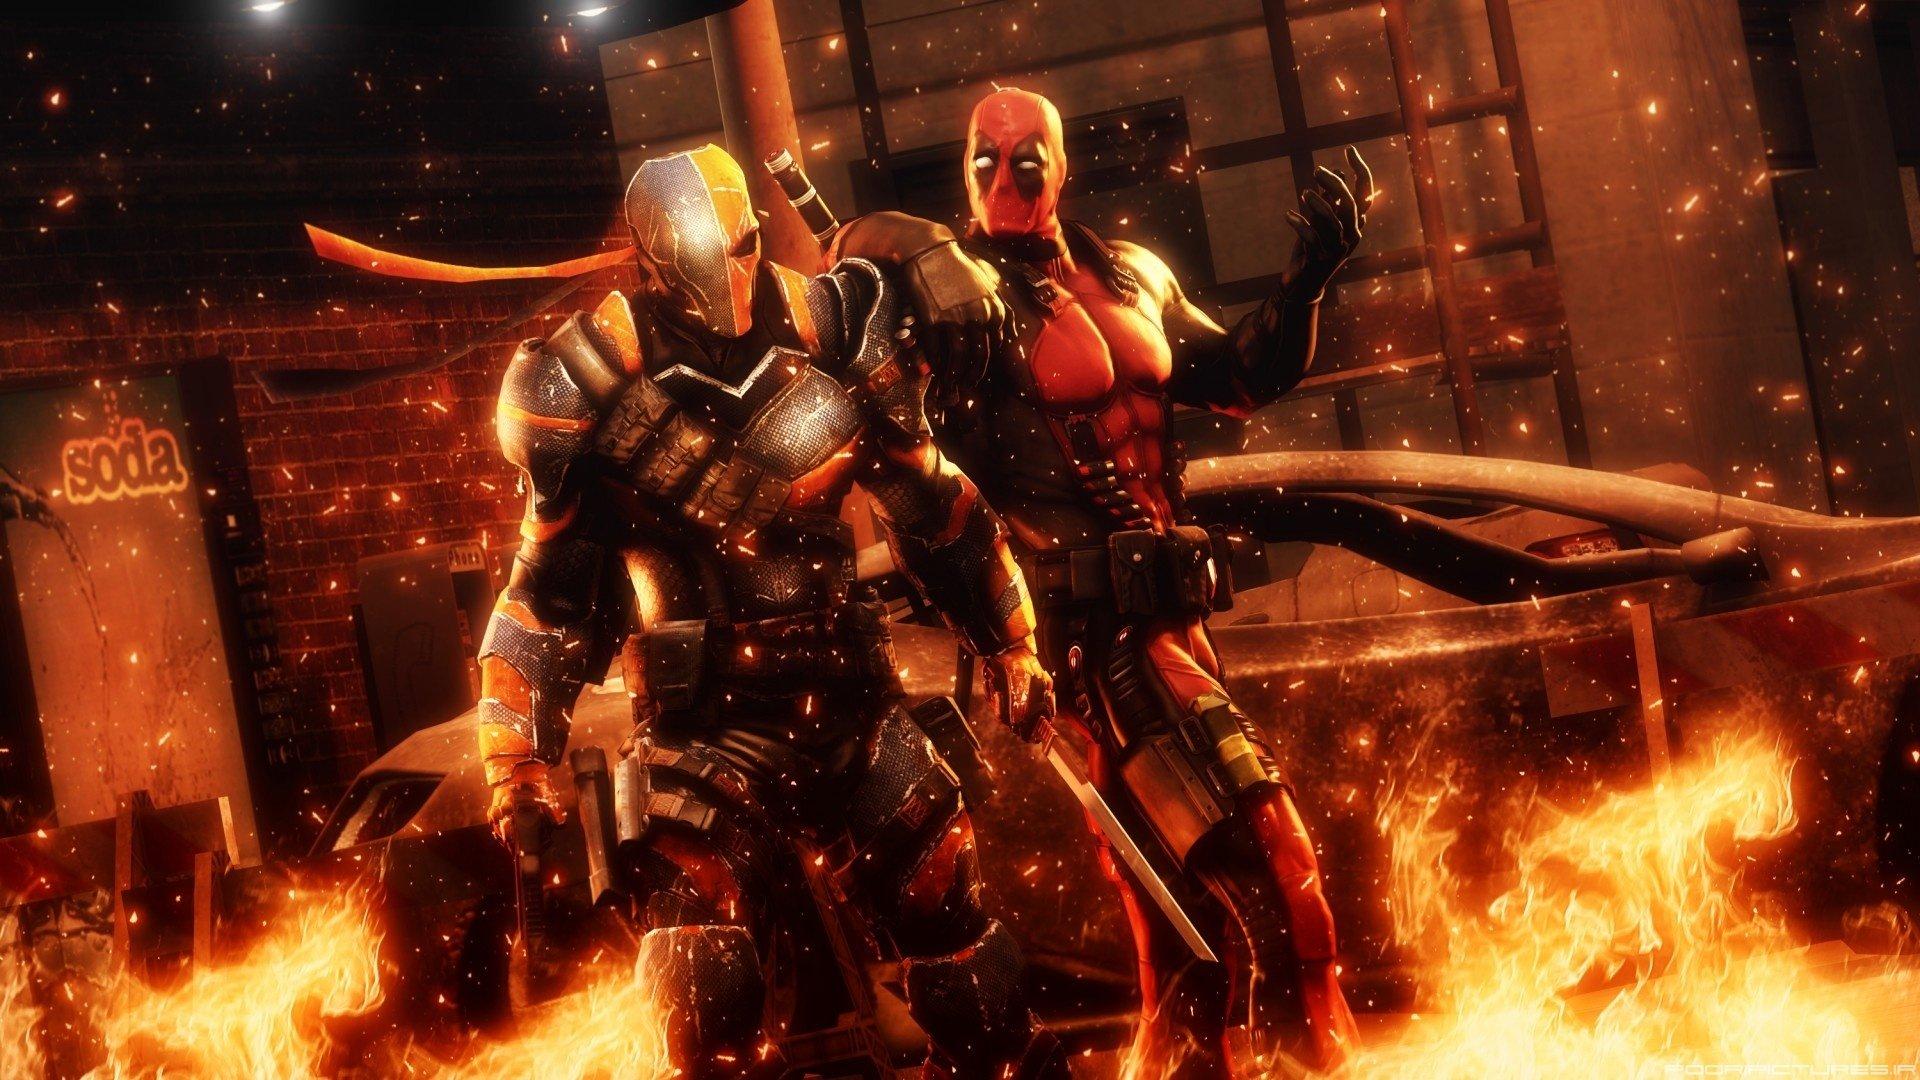 Deadpool Vs Deathstroke Full HD Wallpaper And Background Image